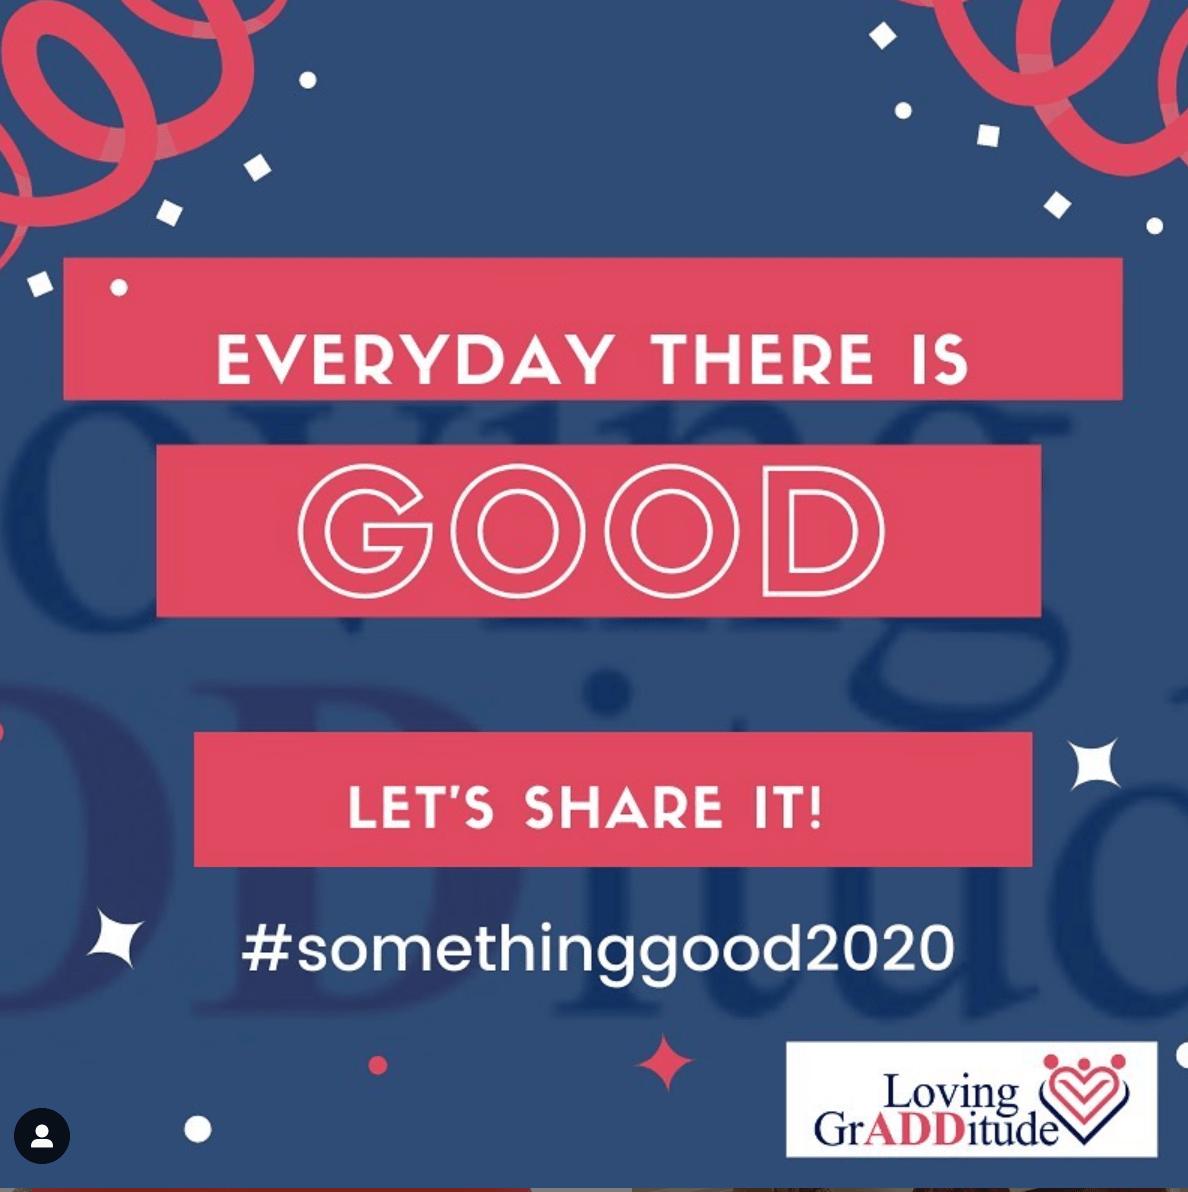 #somethinggood2020